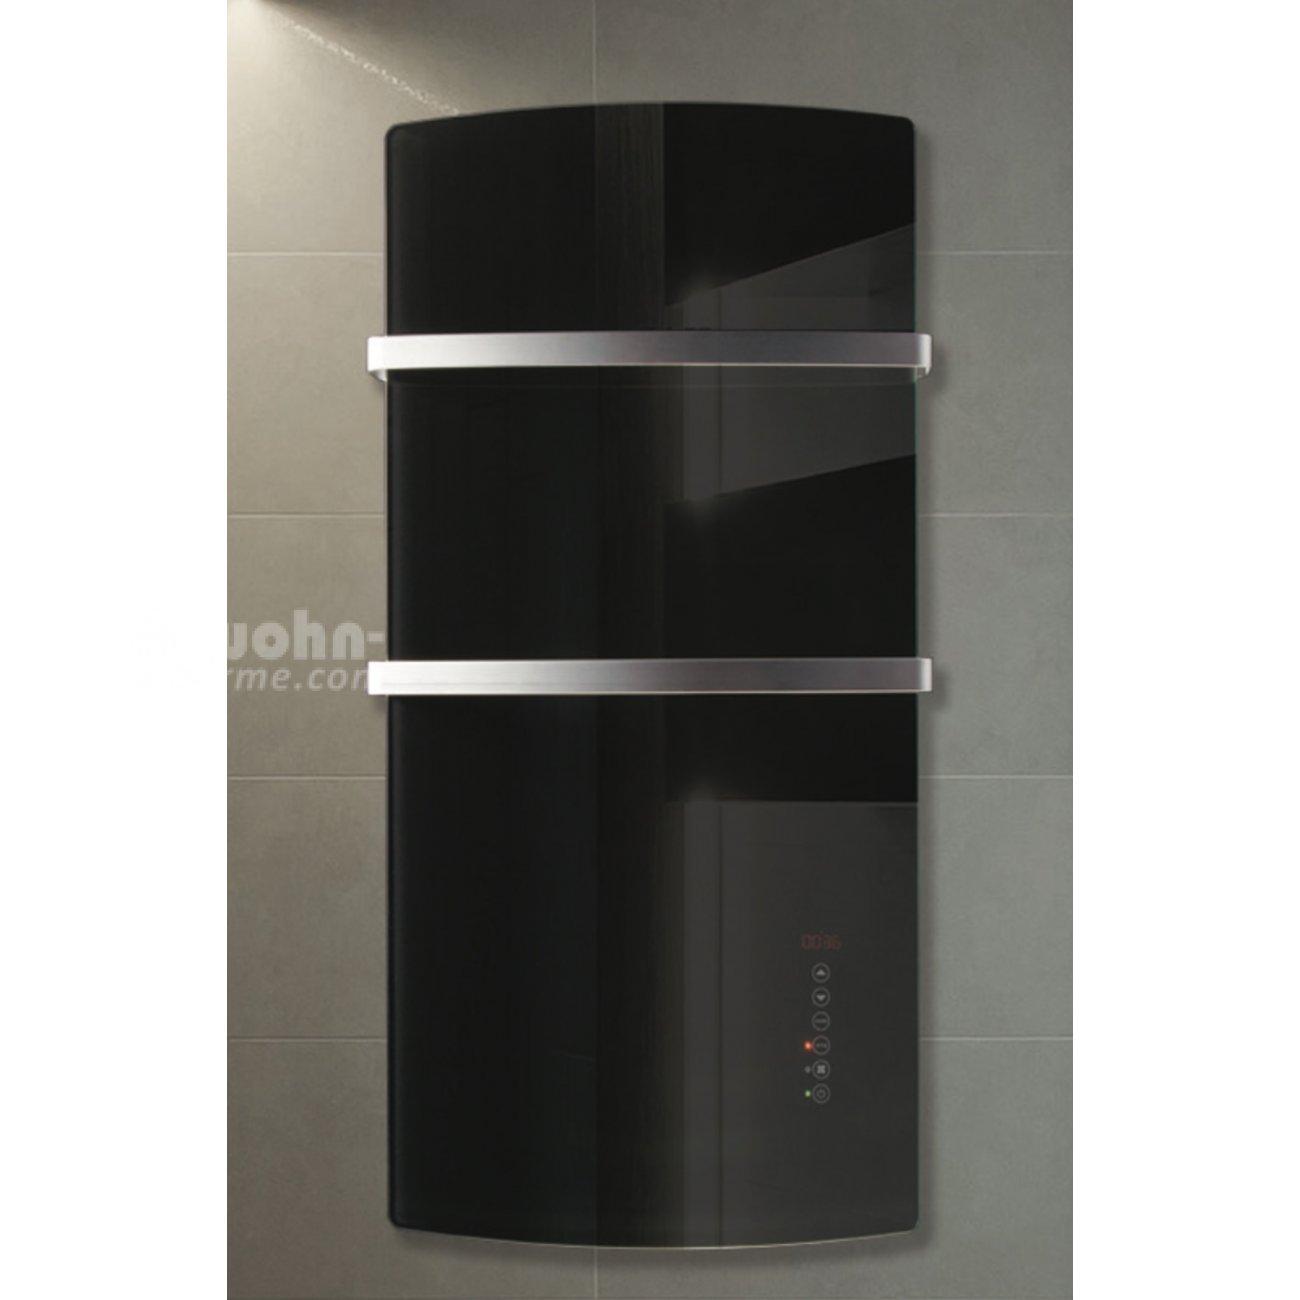 glas infrarotheizung mit turbo funktion. Black Bedroom Furniture Sets. Home Design Ideas